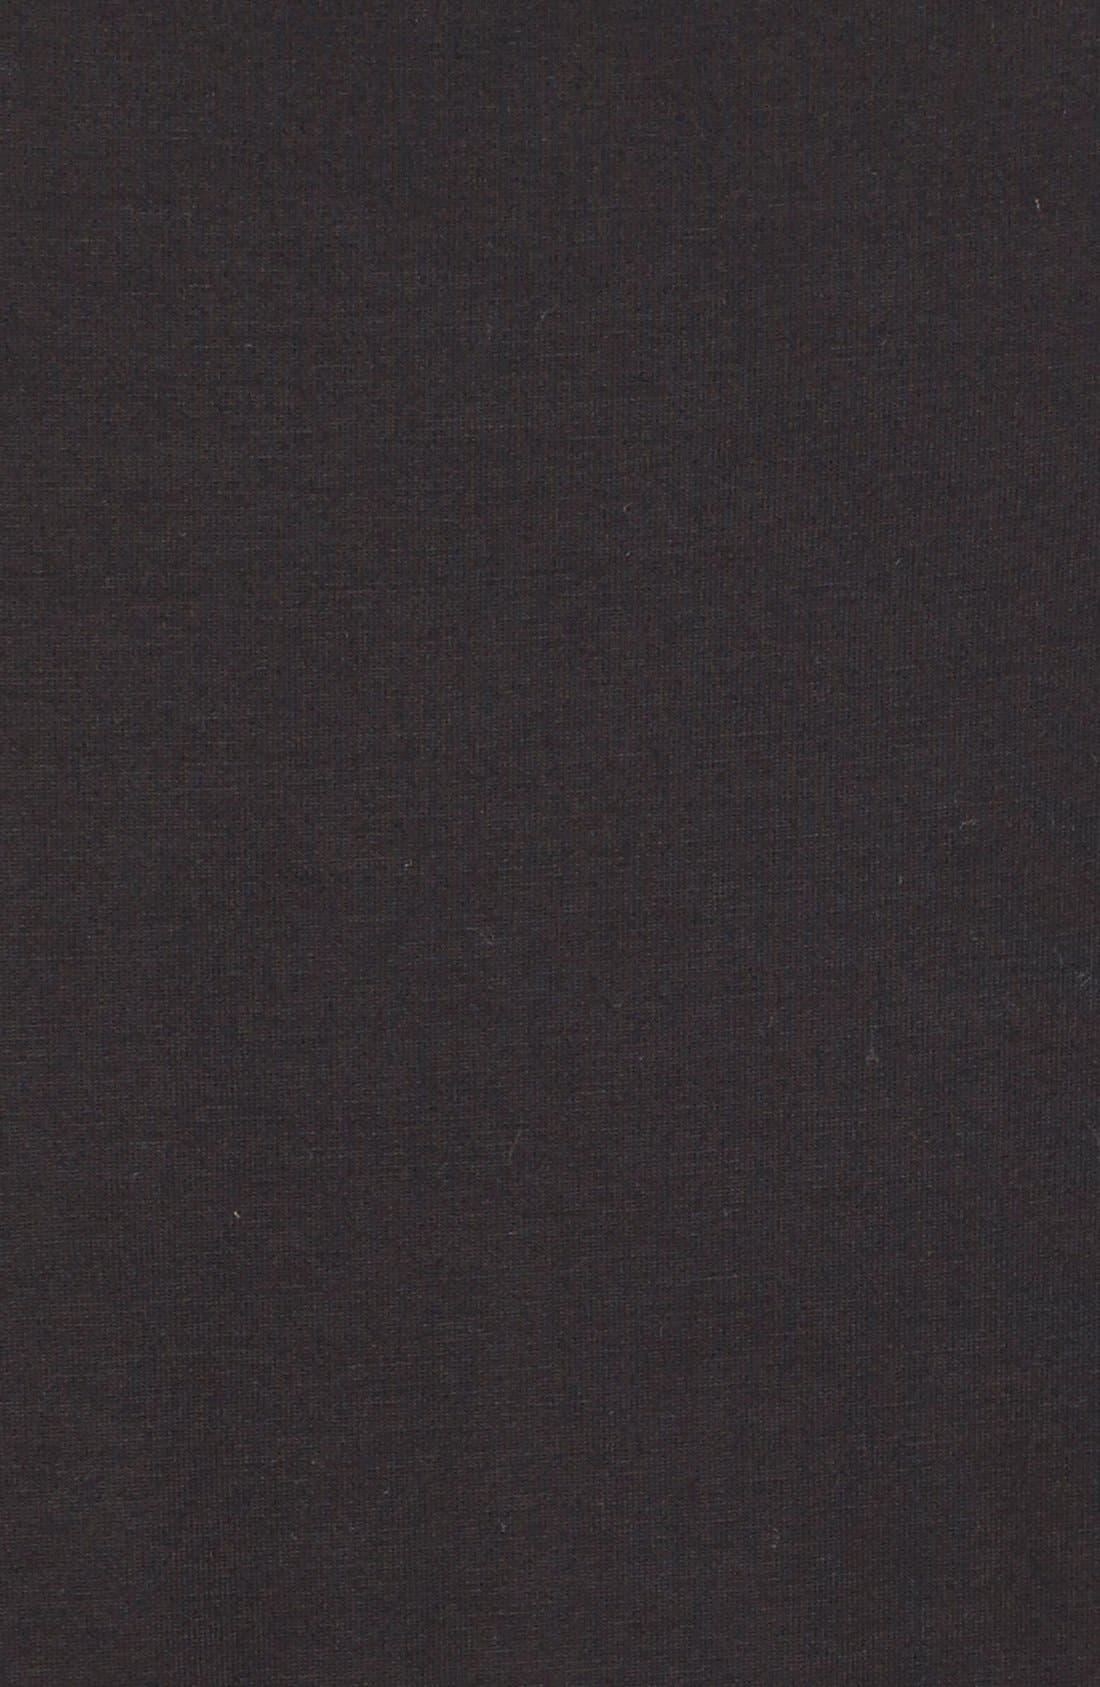 'Lana' Graphic Sleep Dress,                             Alternate thumbnail 3, color,                             001